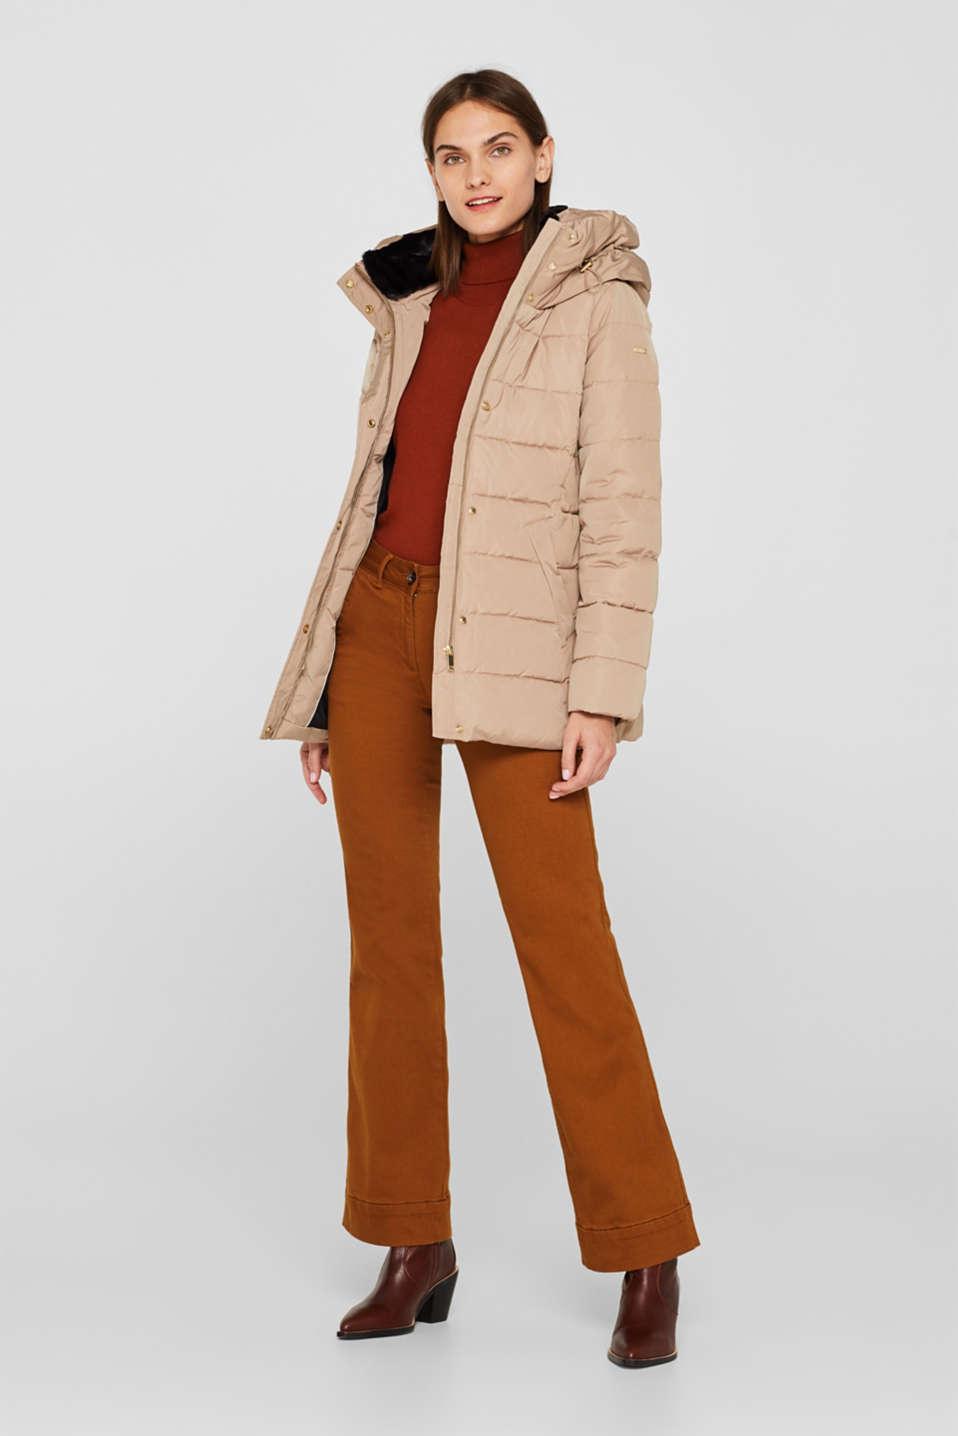 Jackets outdoor woven, SKIN BEIGE, detail image number 5